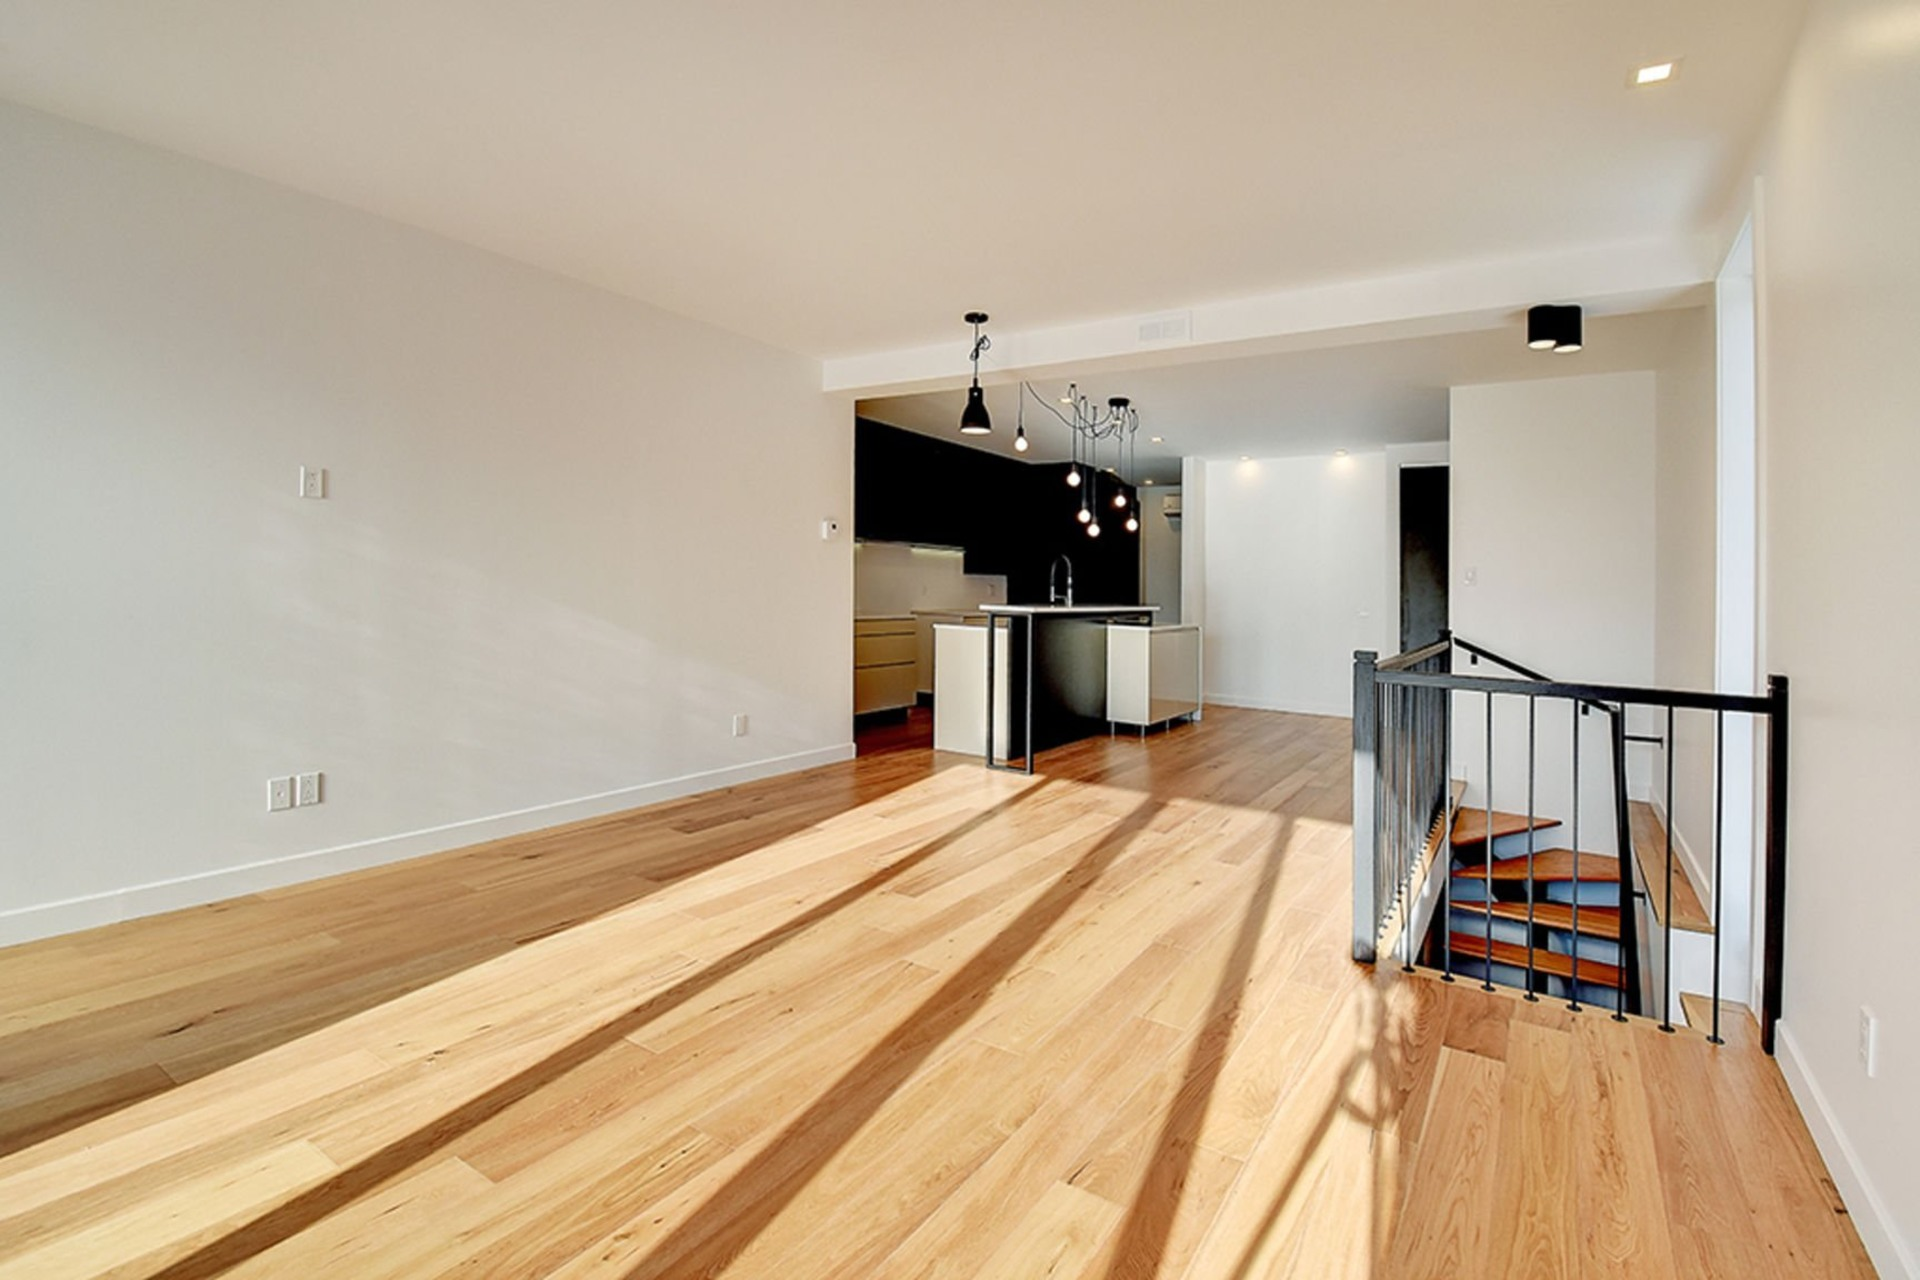 image 6 - Apartment For sale Le Vieux-Longueuil Longueuil  - 9 rooms